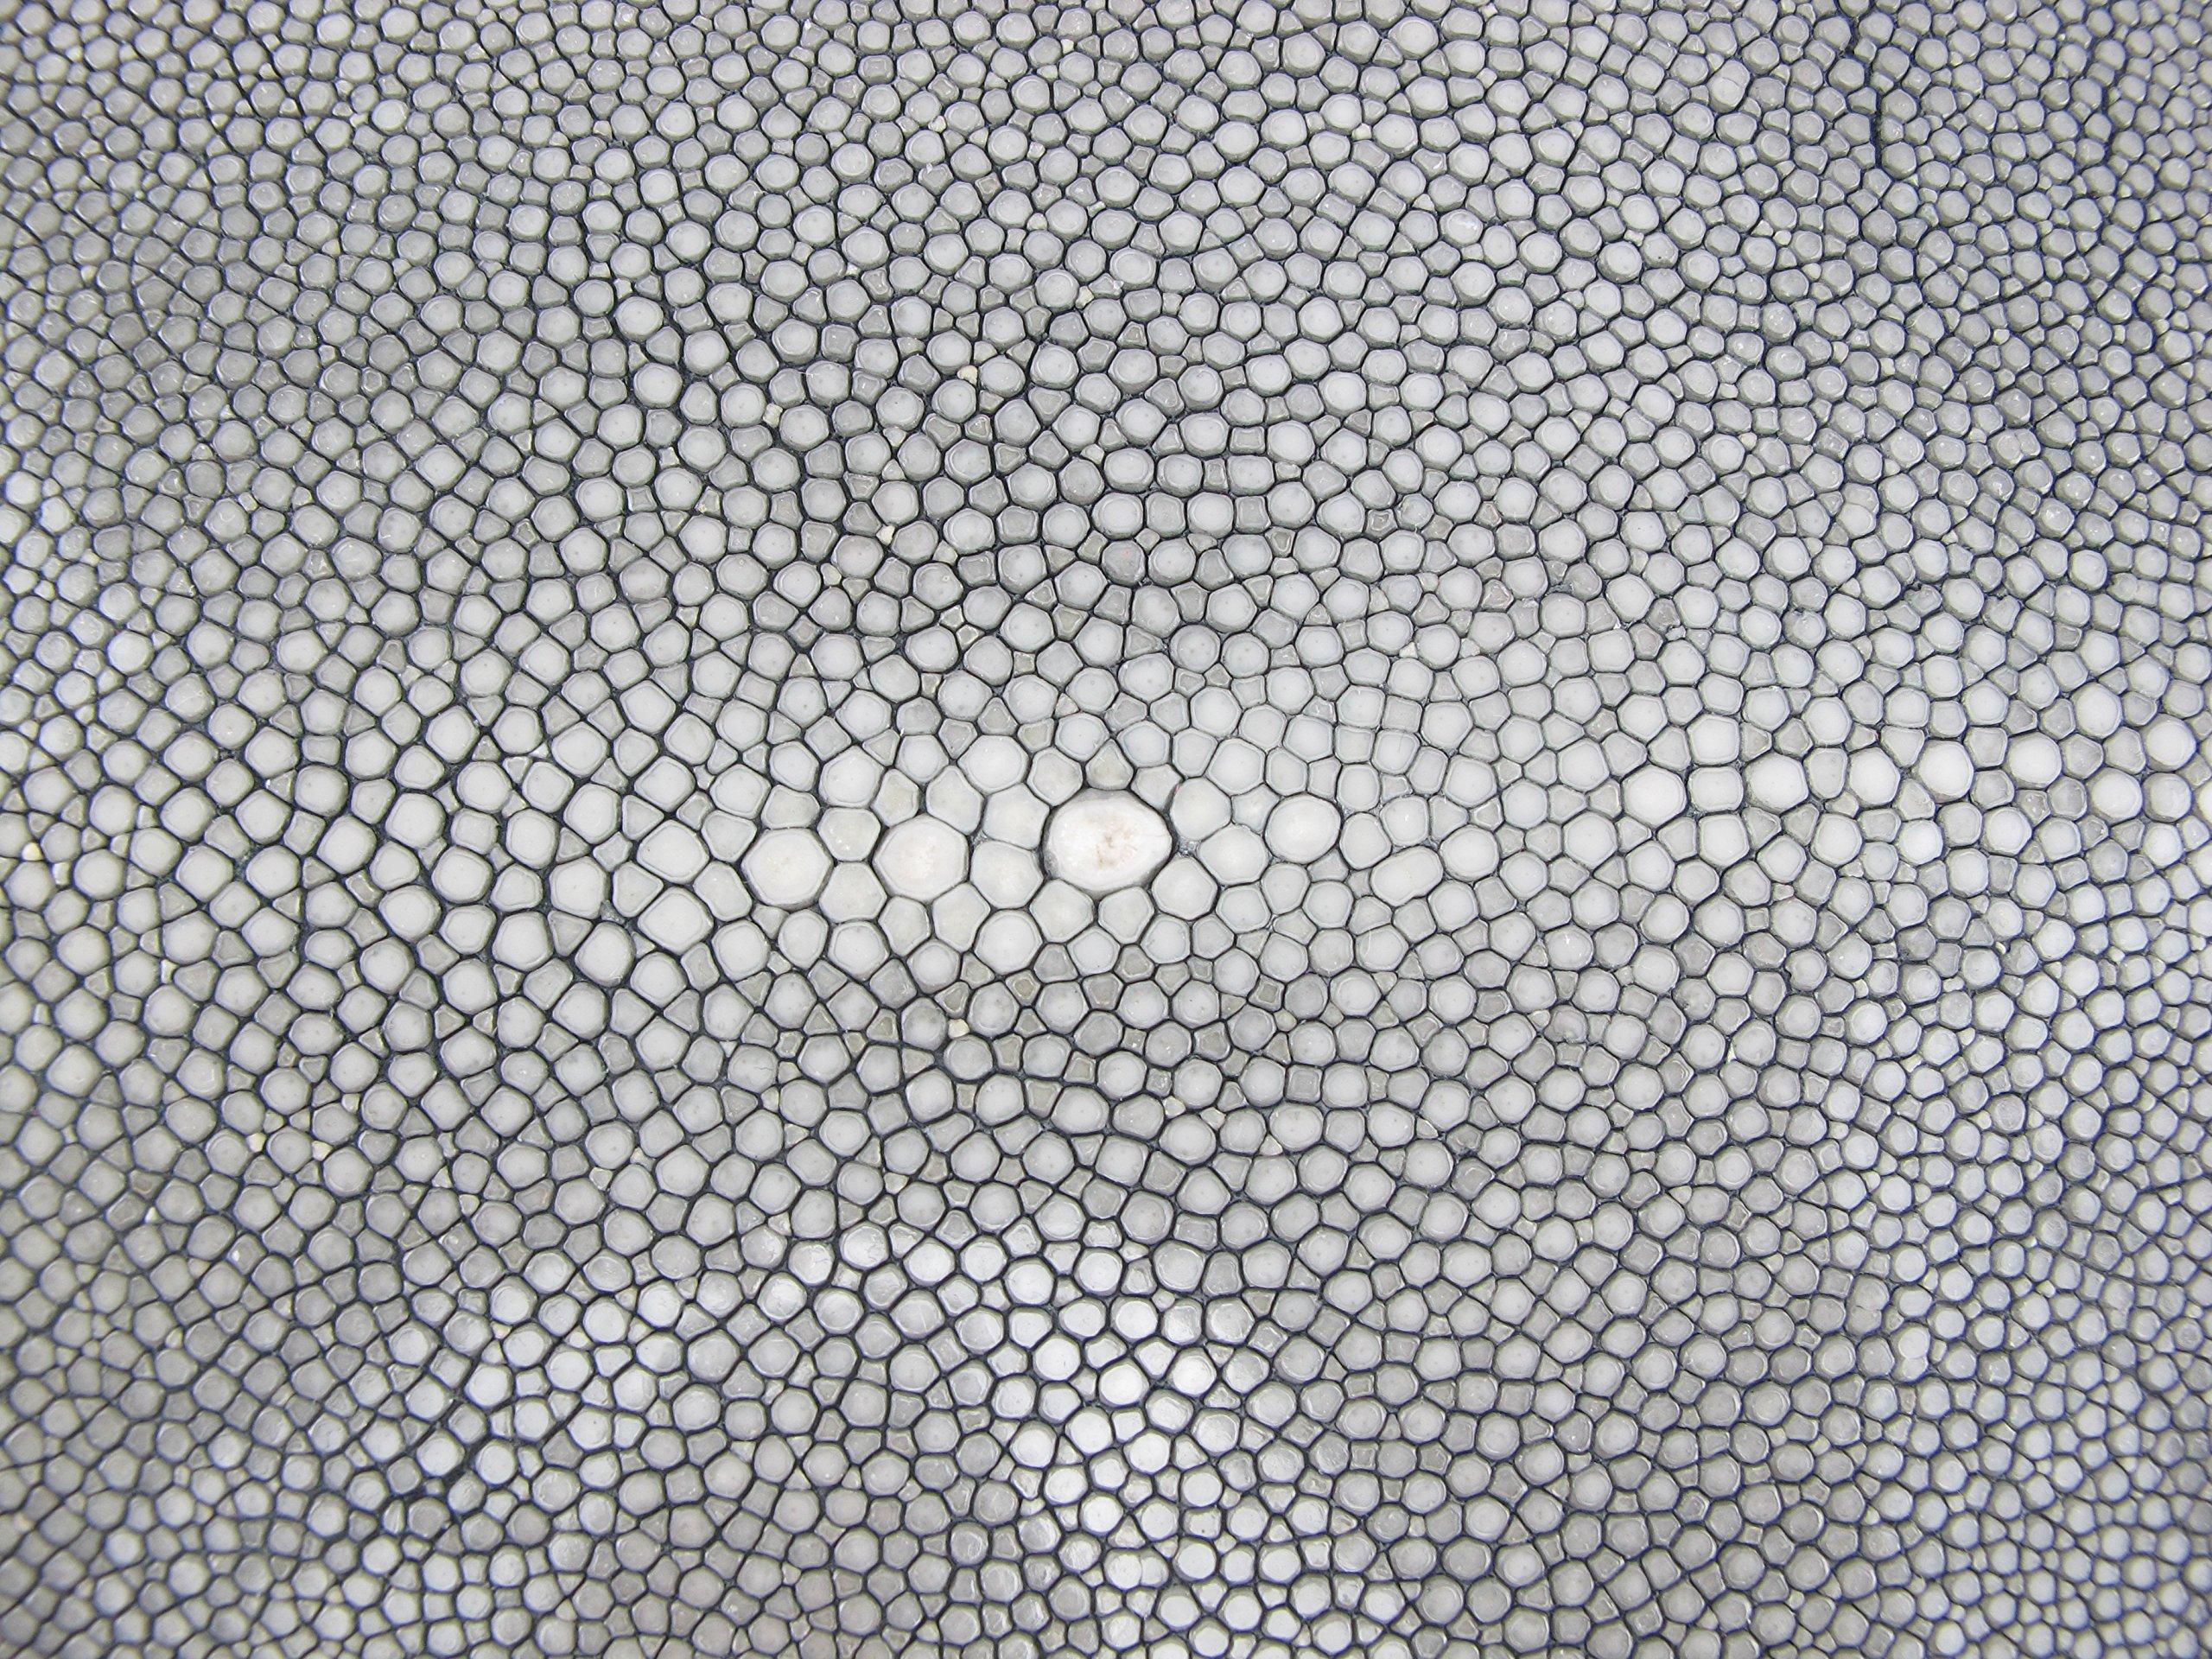 PELGIO Genuine Polished Stingray Skin Leather Hide Pelt Grey (7'' x 16'') by Pelgio (Image #2)